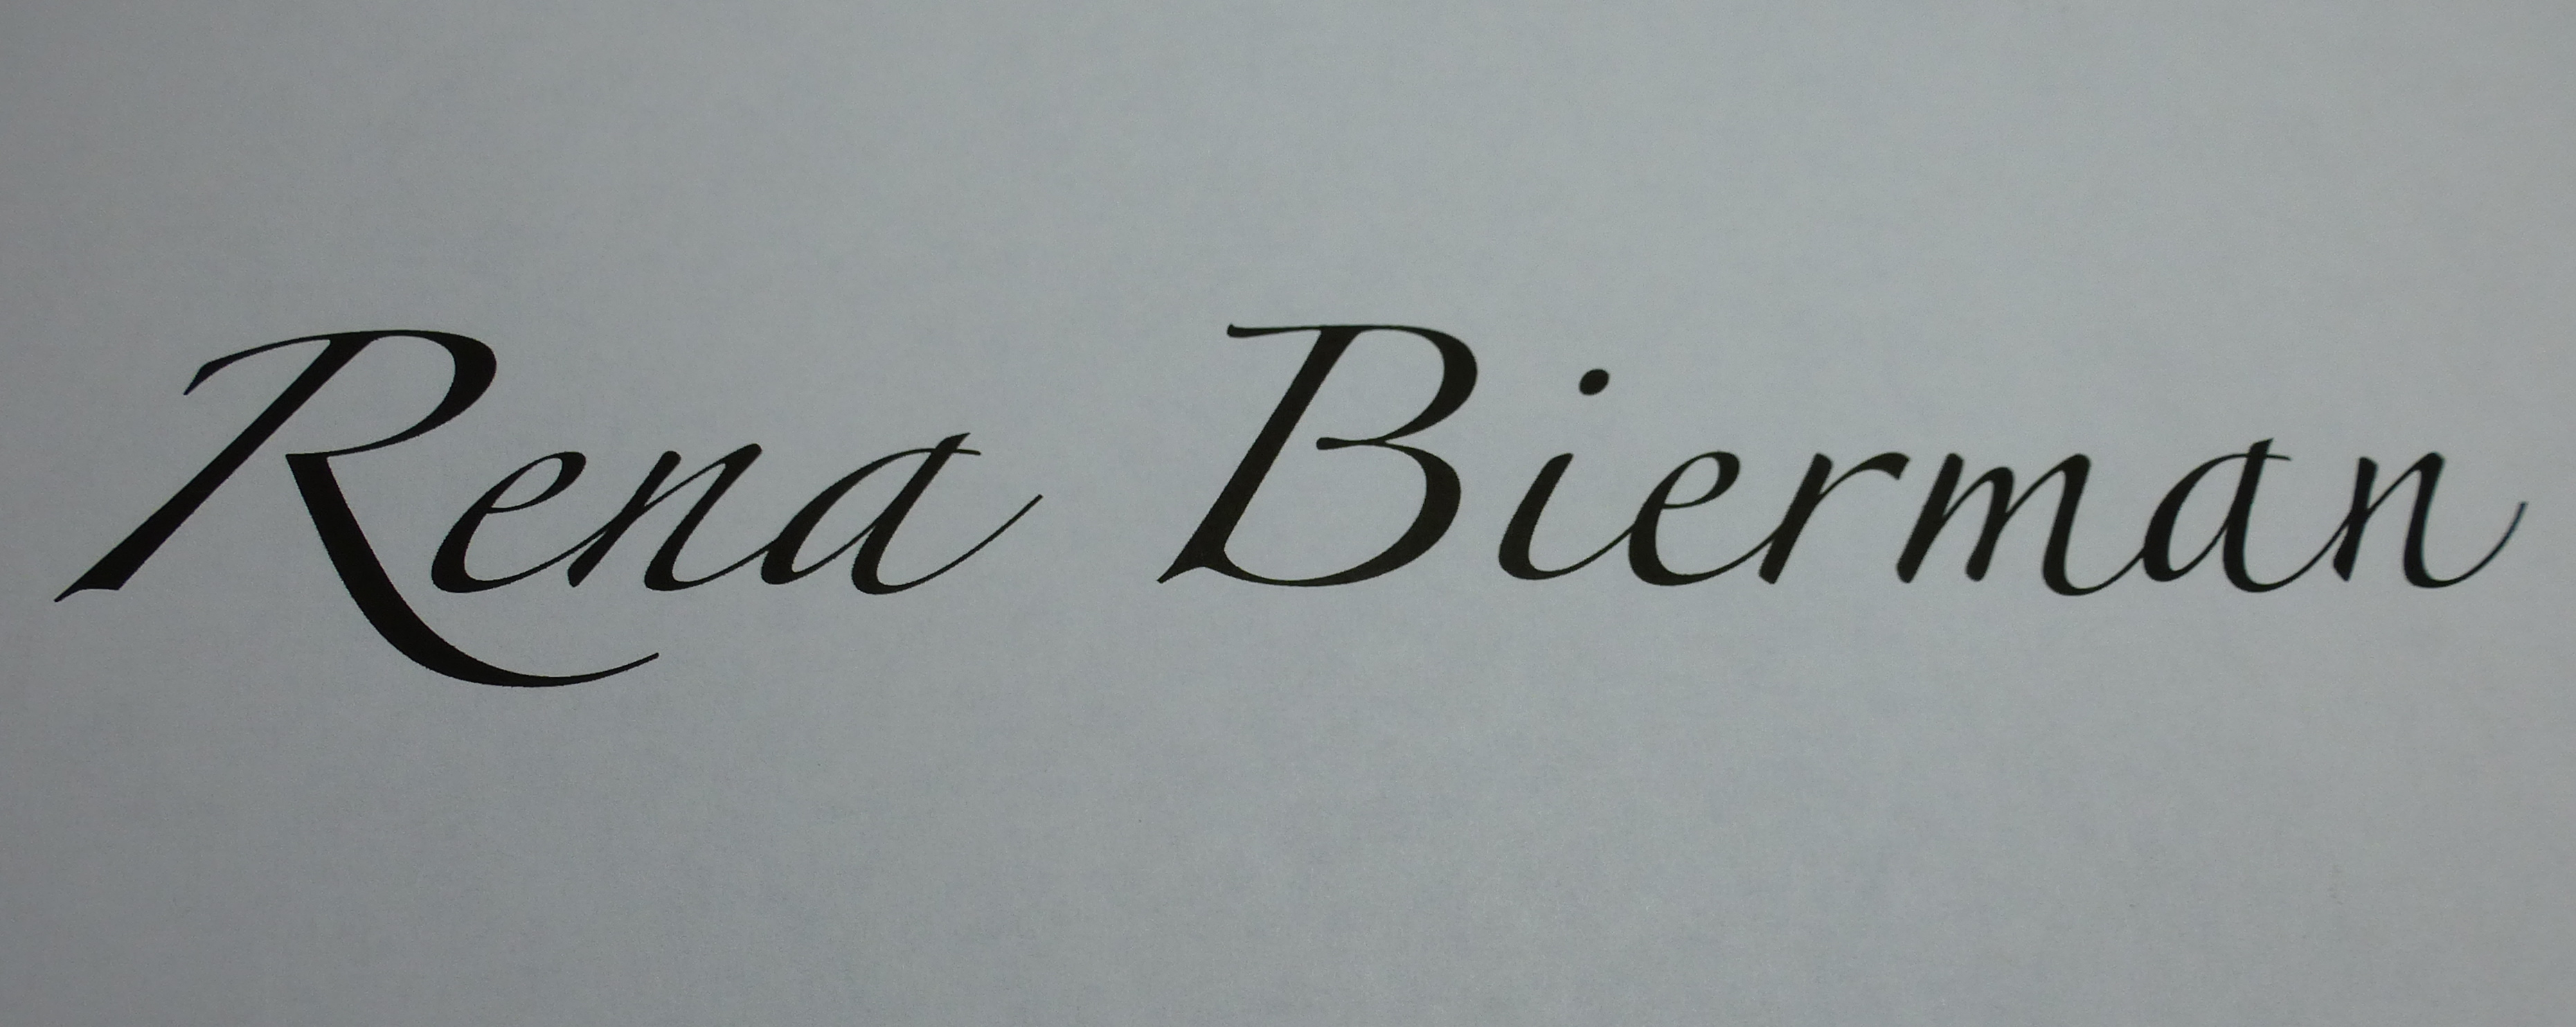 Rena Bierman Signature